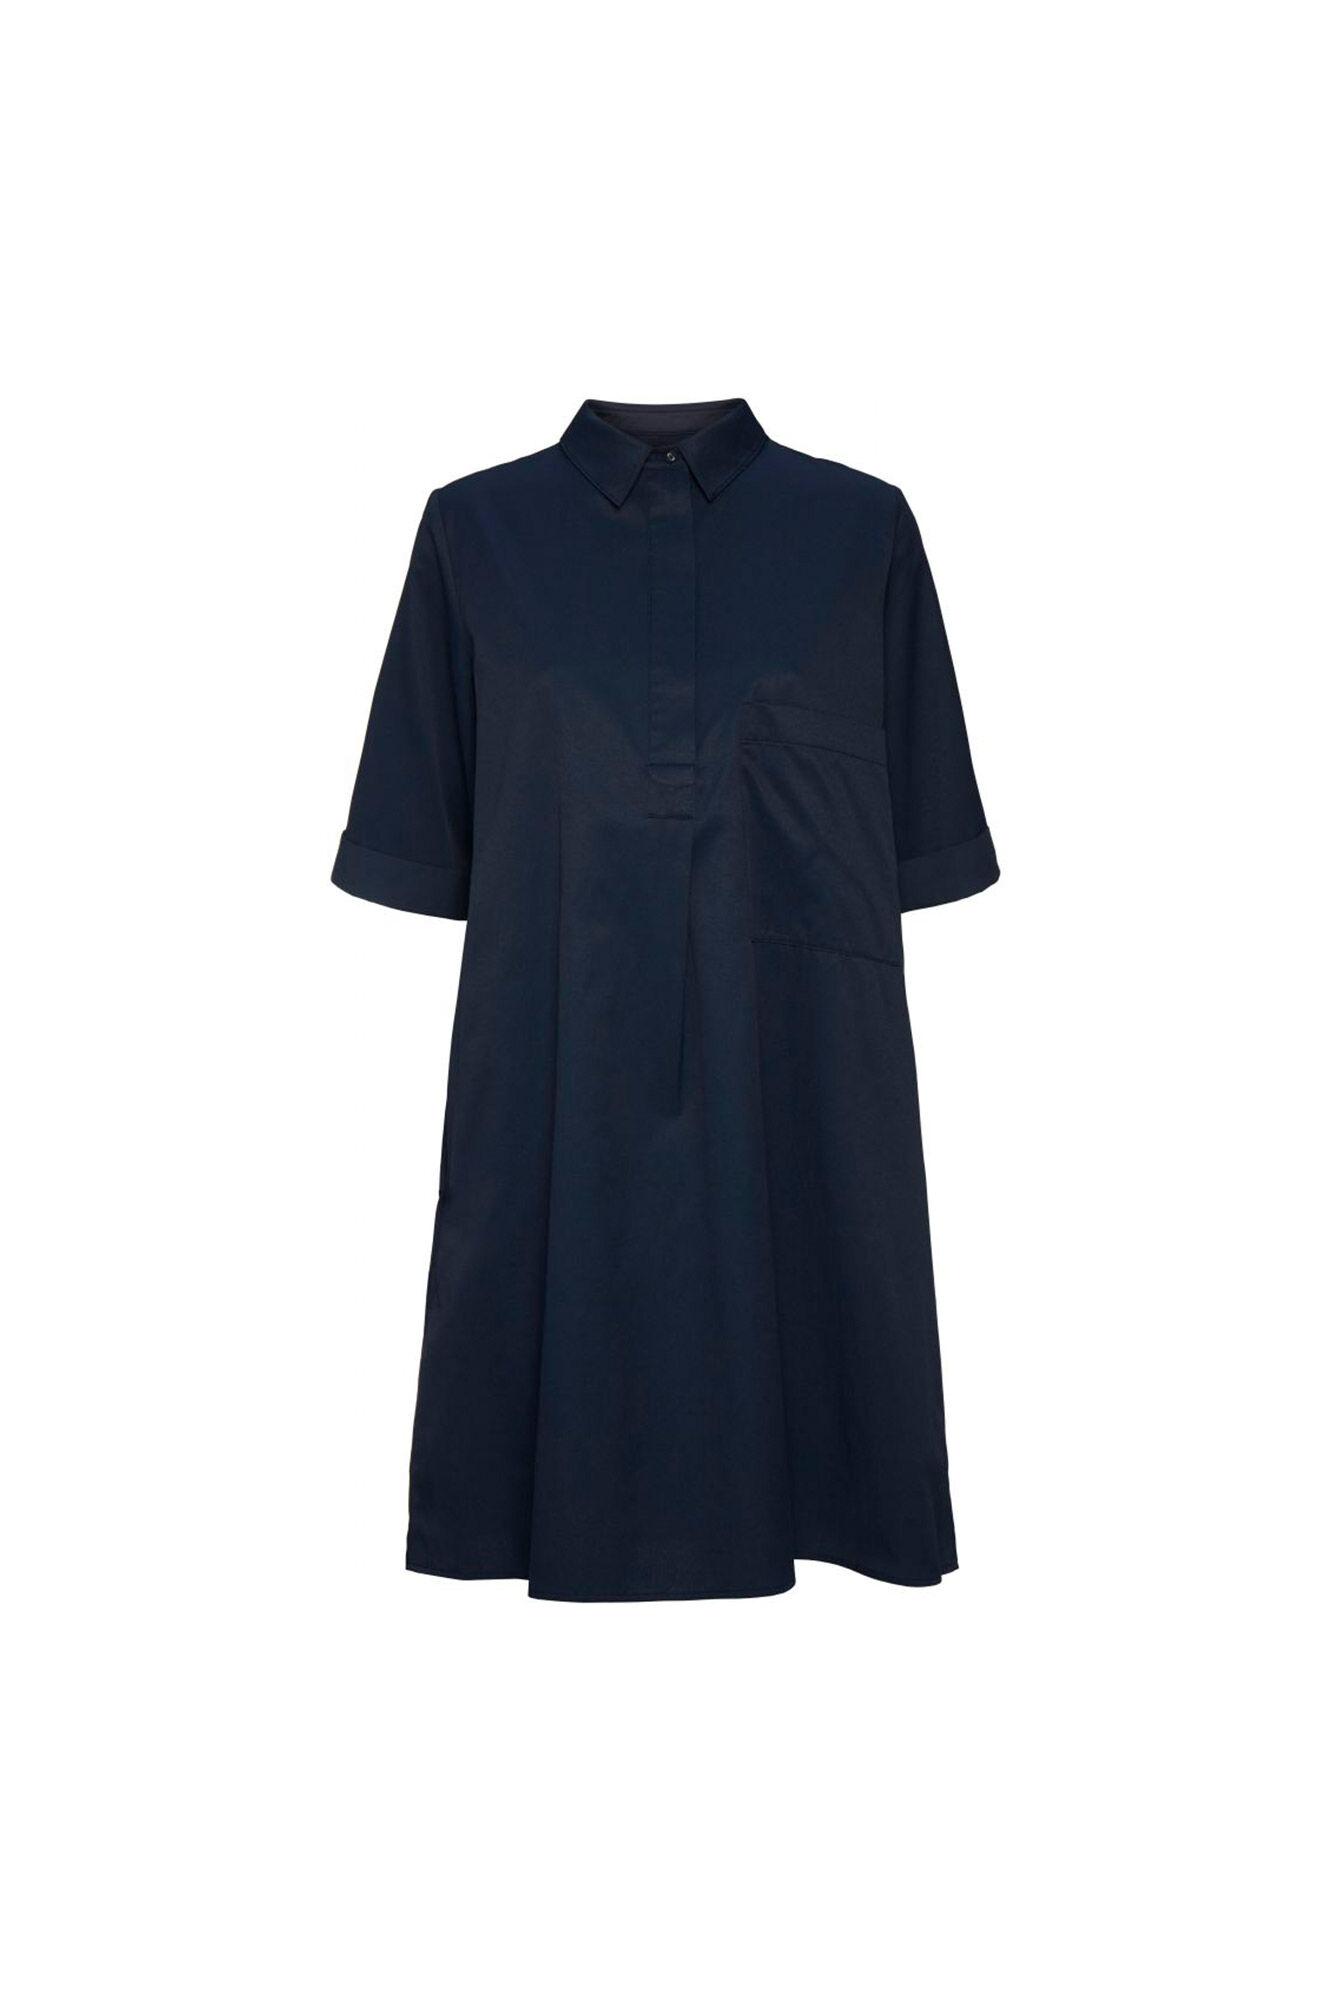 Mimi dress 11820037, NAVY